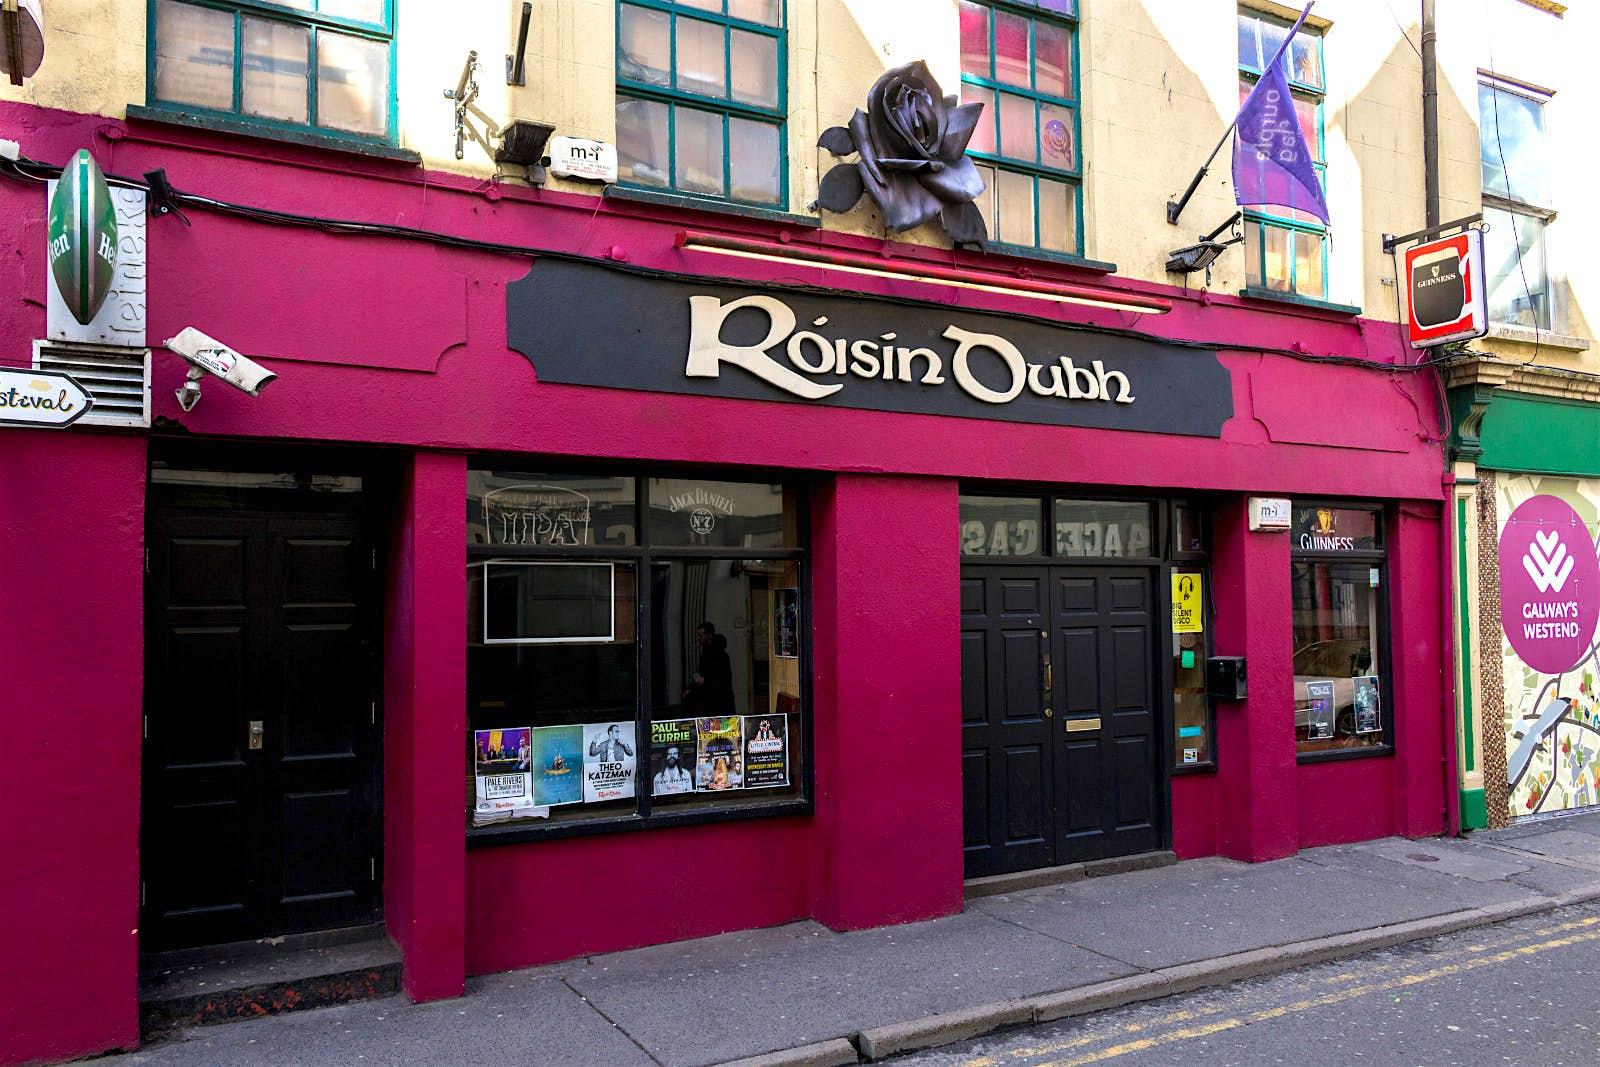 Róisín Dubh in Galway